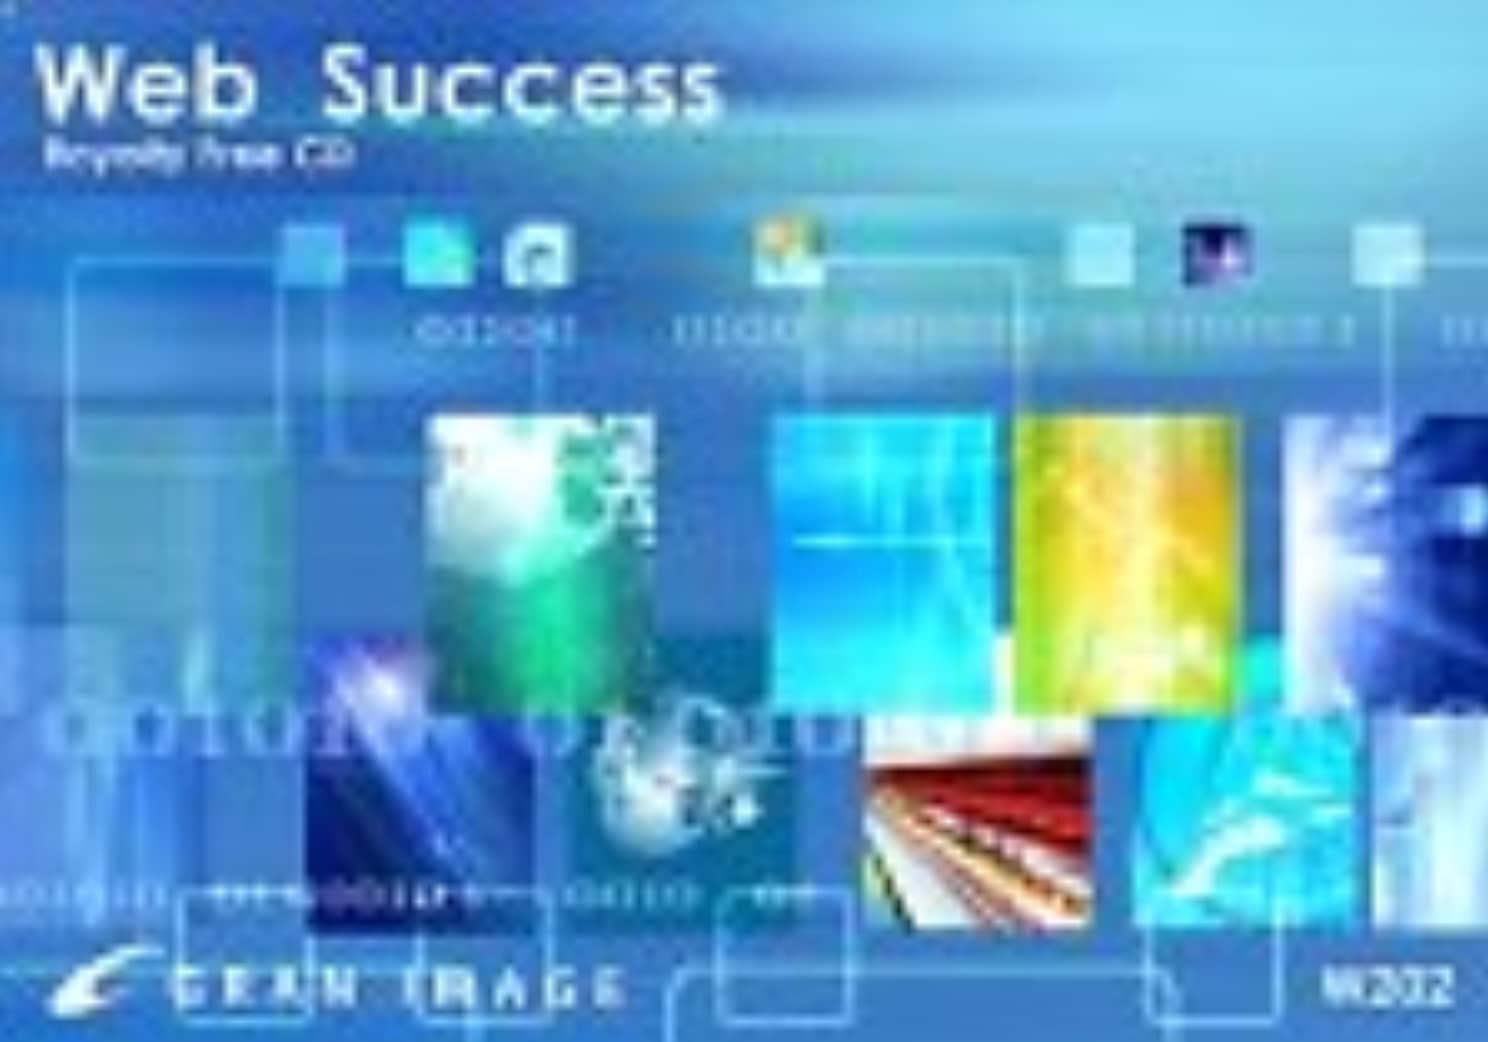 GRAN IMAGE W202 Web Success